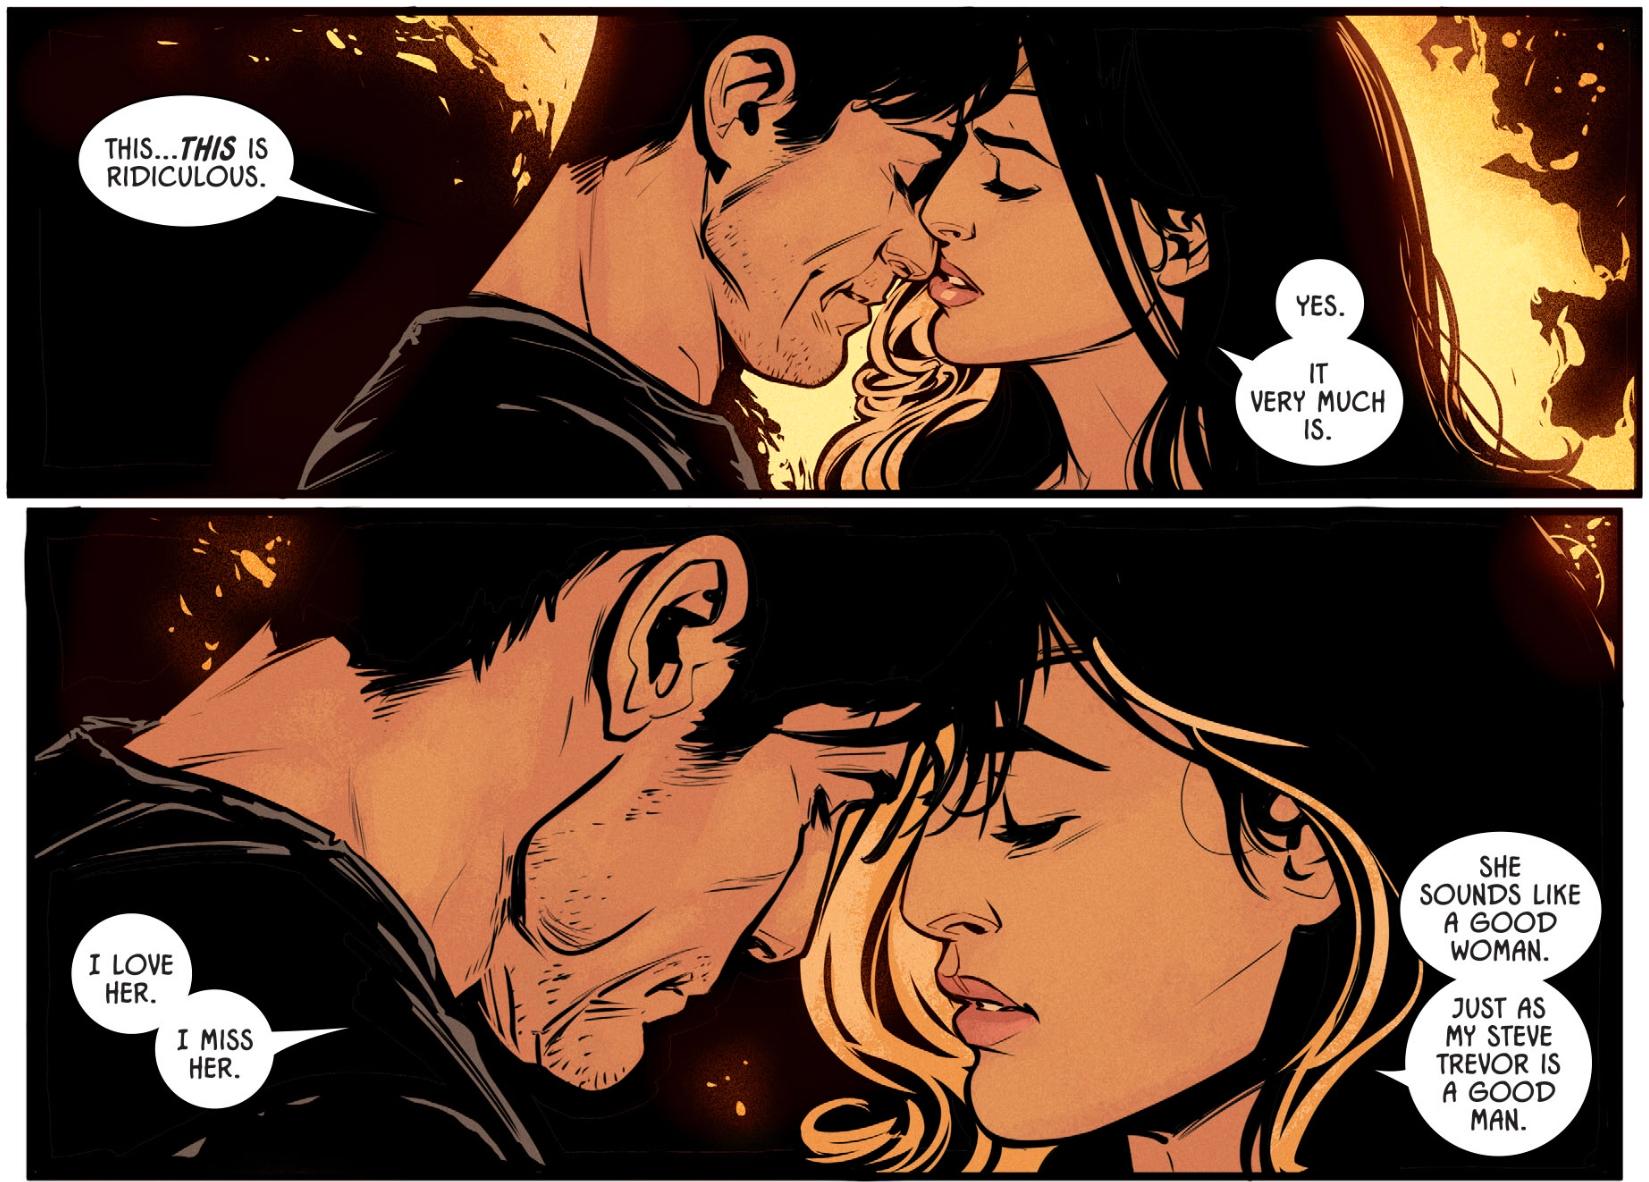 Wonder woman cheats on superman